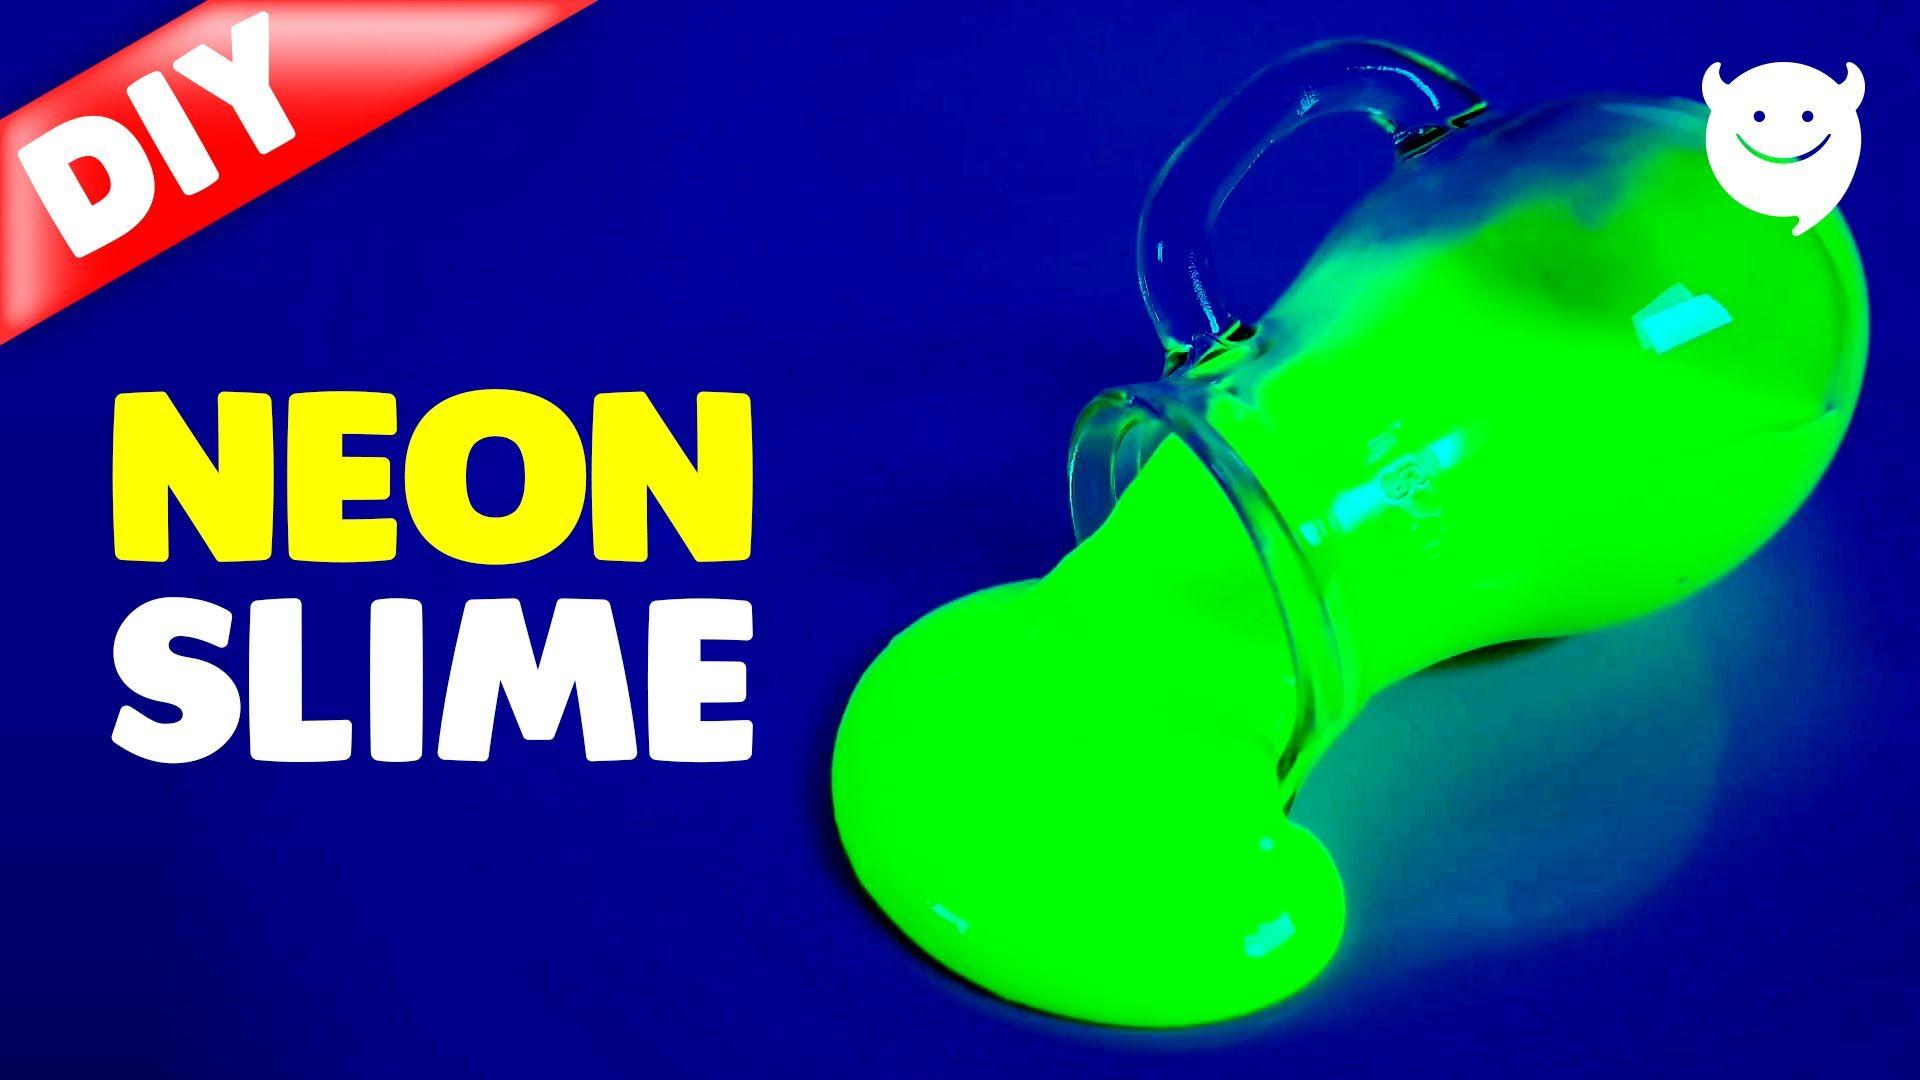 How to make neon slime diy dark slime make slime pinterest how to make neon slime diy dark slime ccuart Images